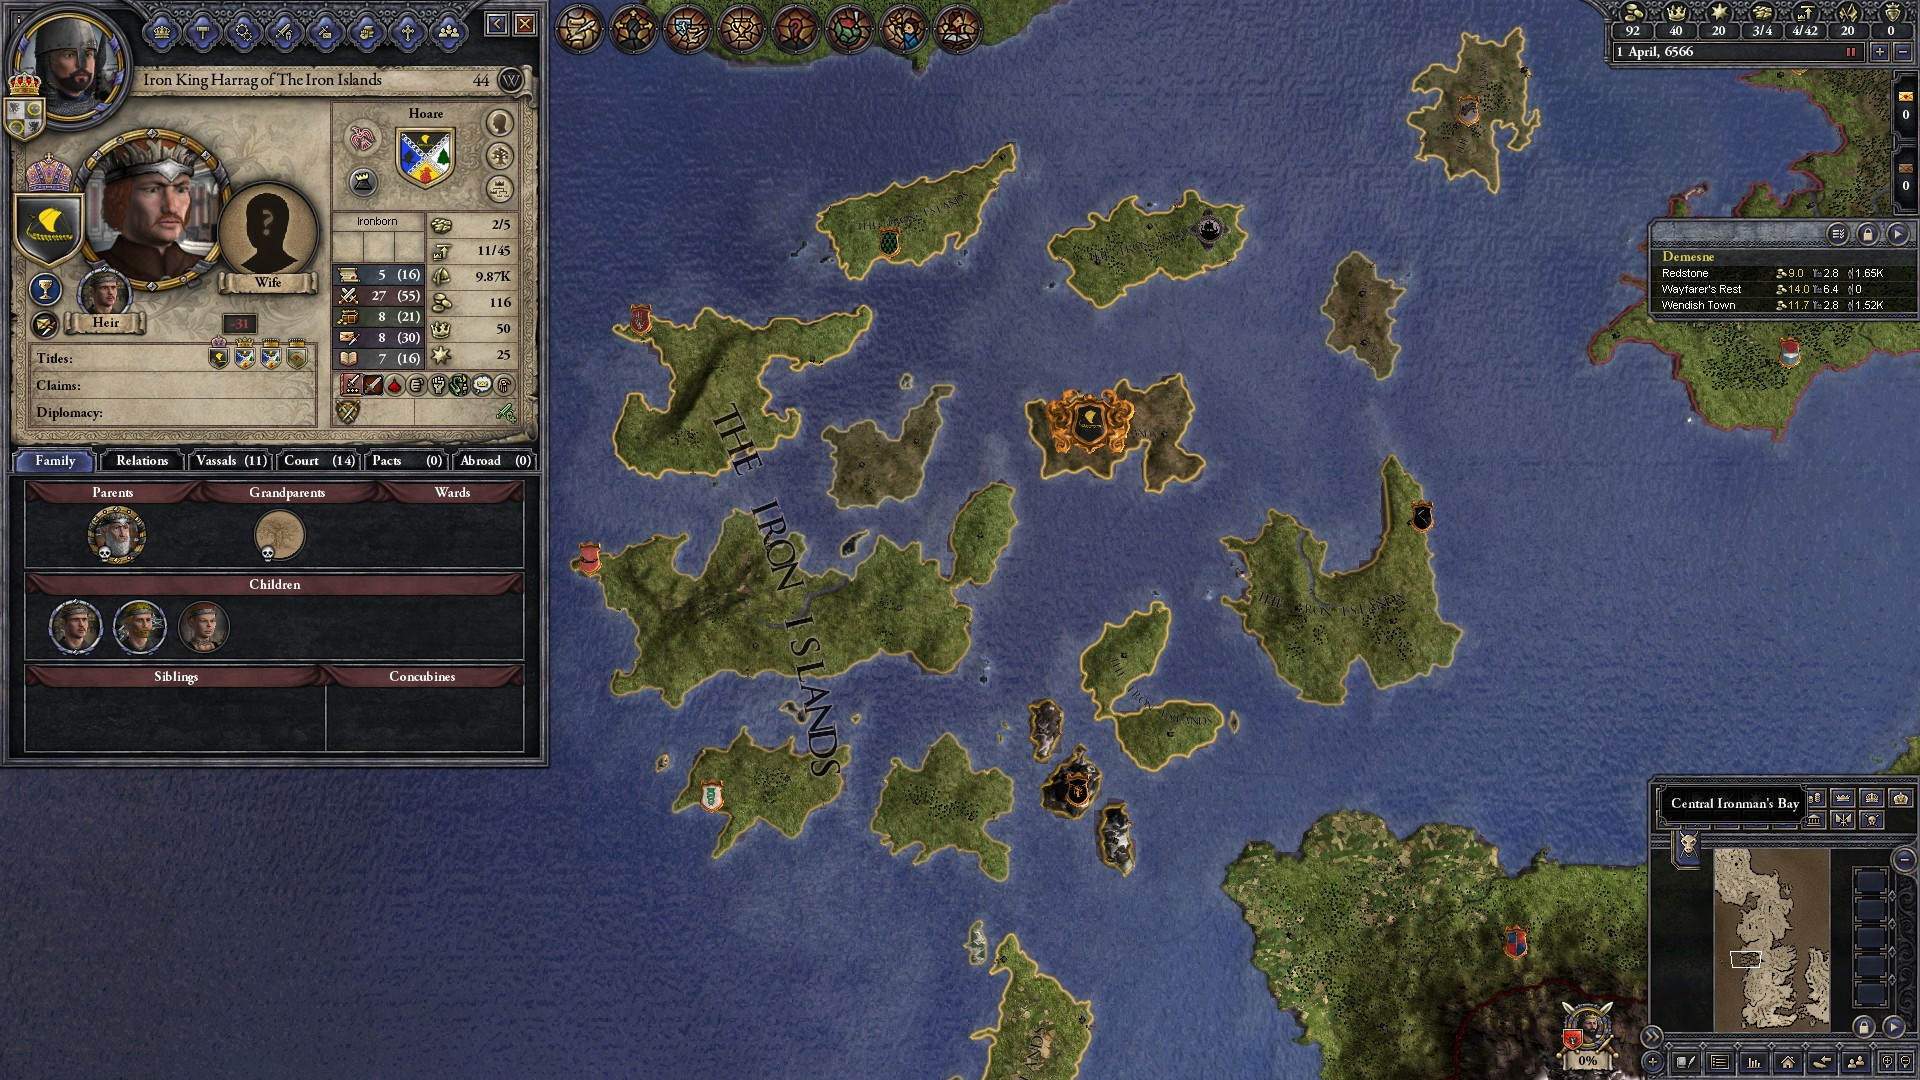 Crusader Kings II: The Seven Kingdoms mod - Mod DB